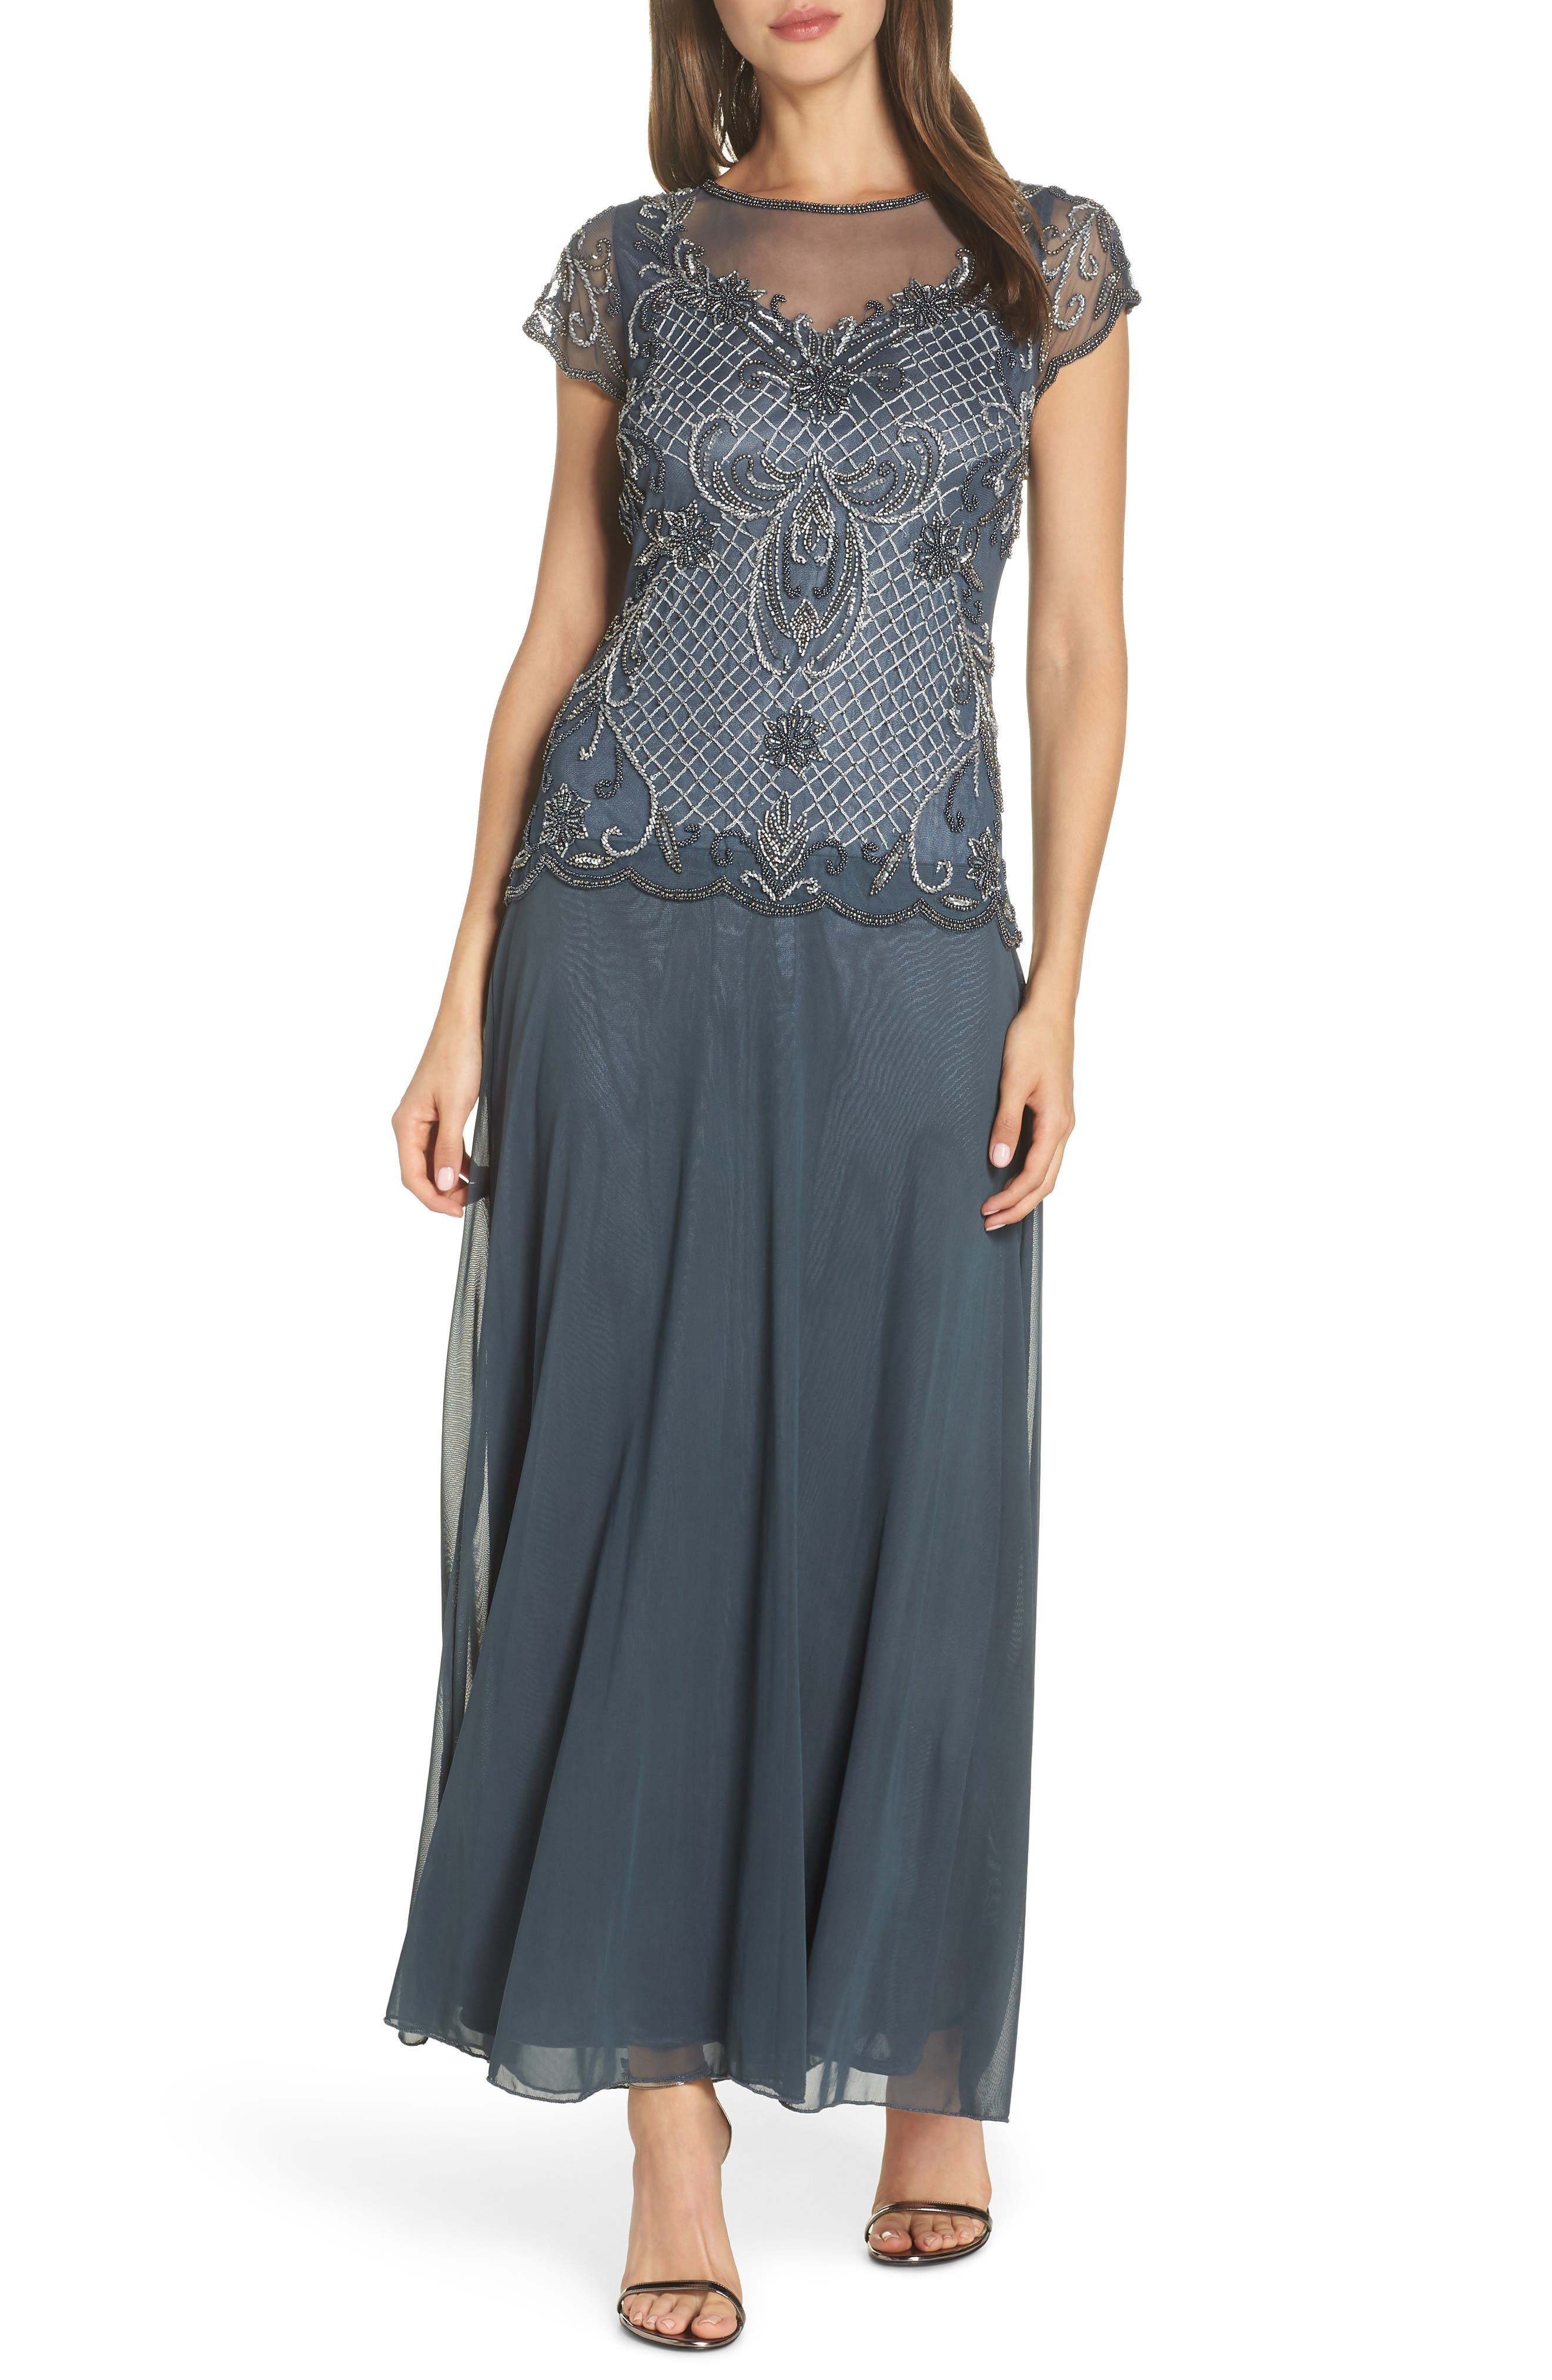 PISARRO NIGHTS, Mock Two-Piece Beaded Bodice Evening Dress, Main thumbnail 1, color, SLATE